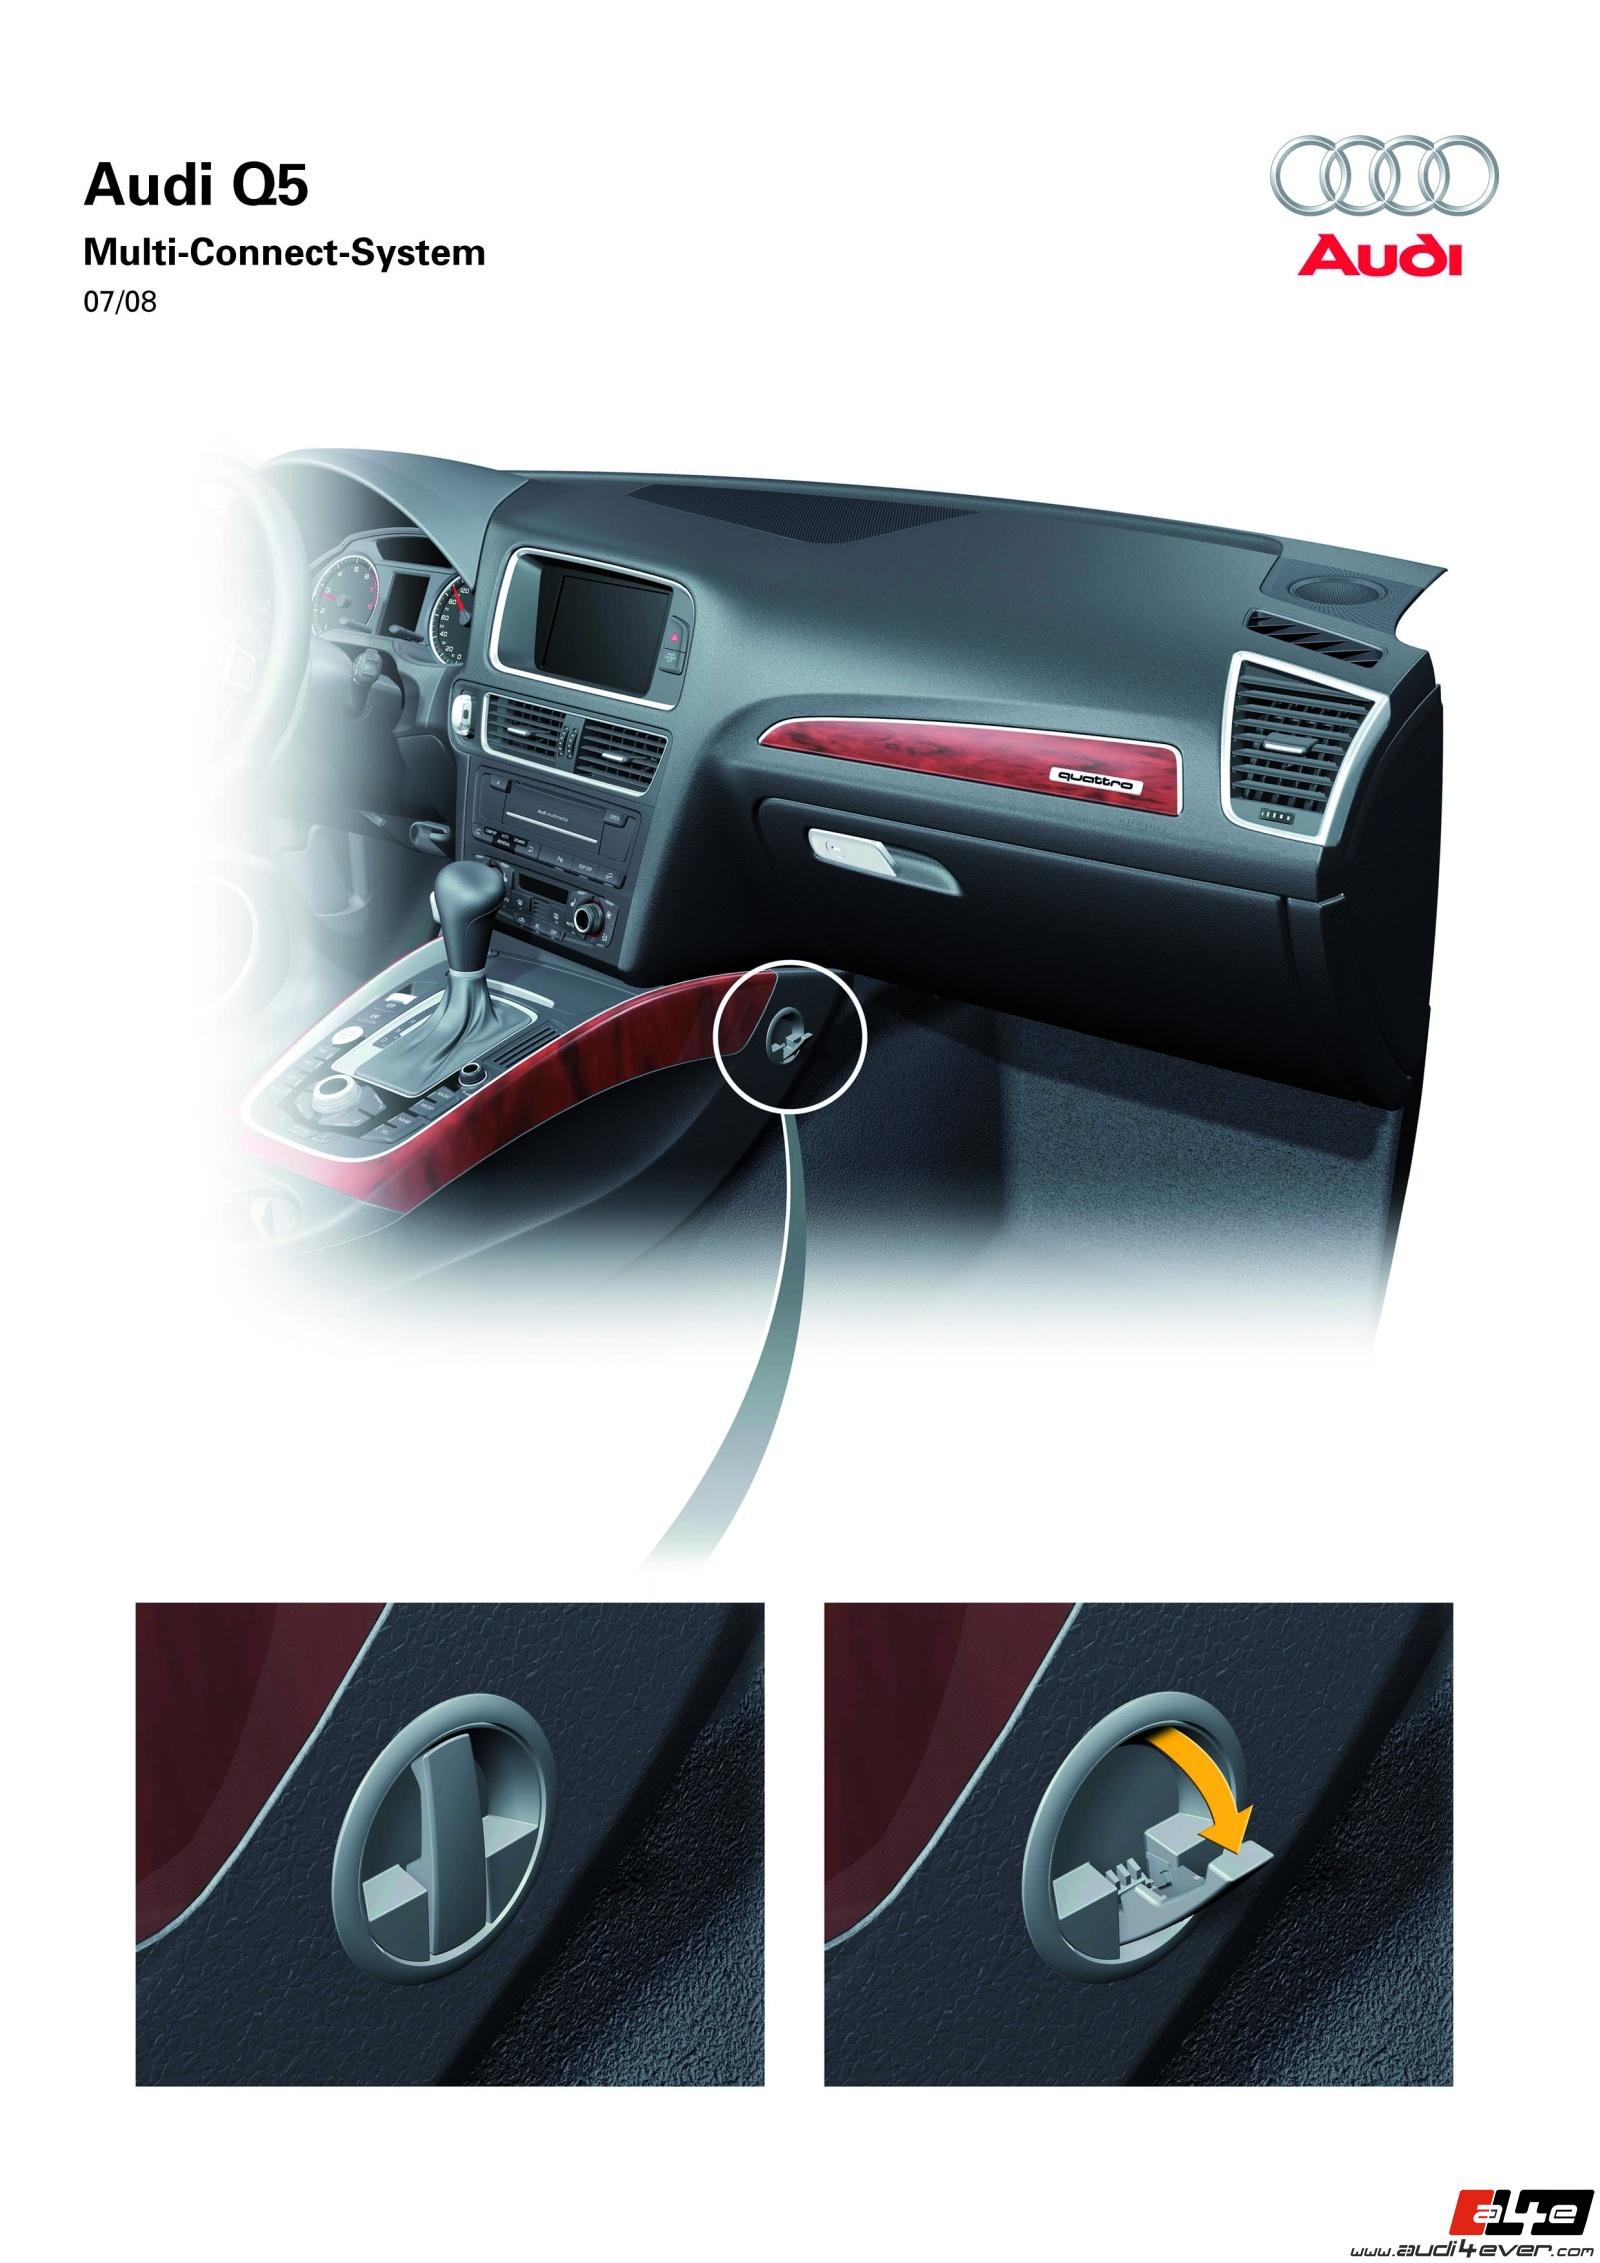 A4e Gallery Audi Q5 Audi Q5 Technik Amp Design